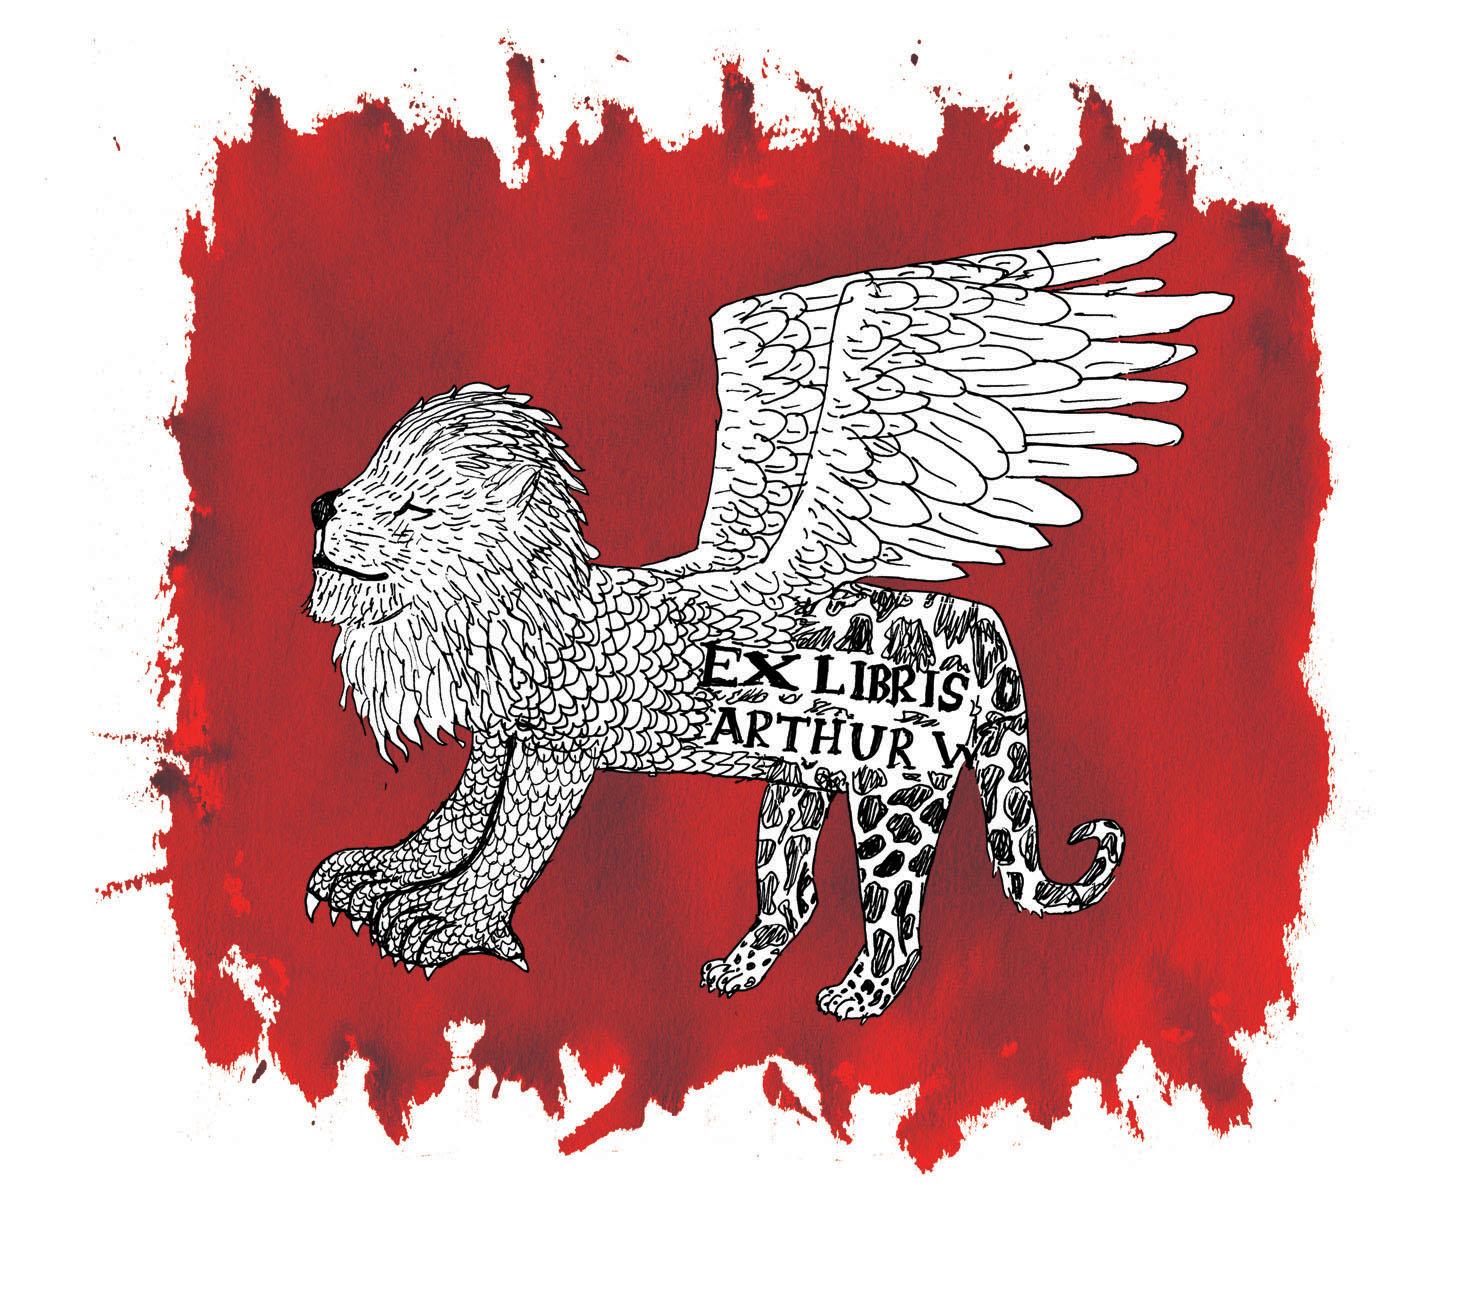 Arthur's heraldic beast bookplate